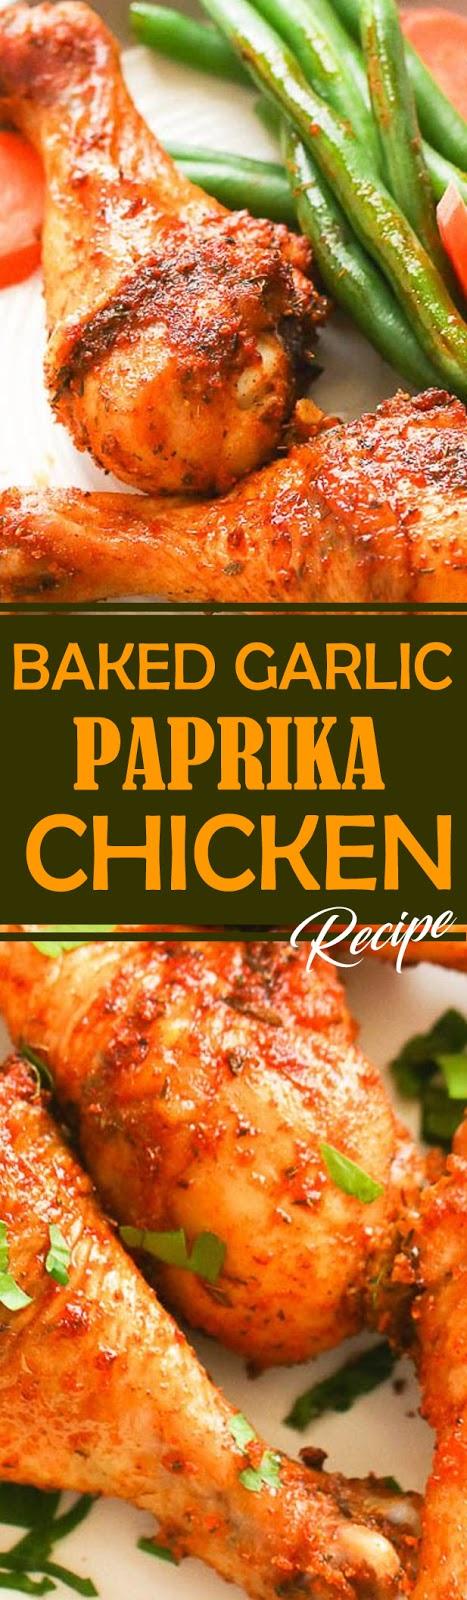 Baked Garlic Paprika Chicken